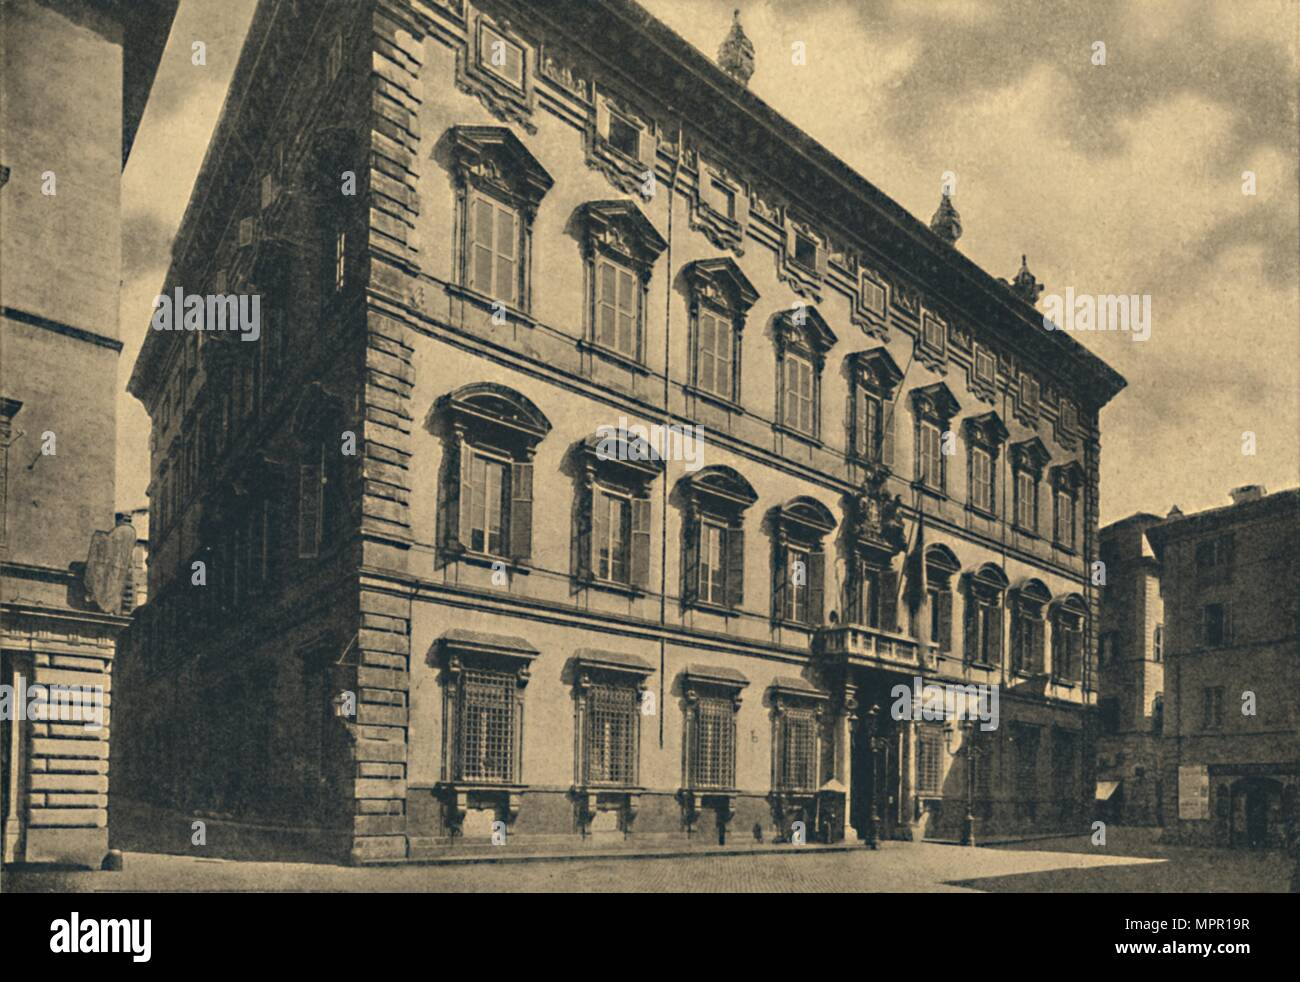 'Roma - Palace of the Senate', 1910. Artist: Unknown. - Stock Image